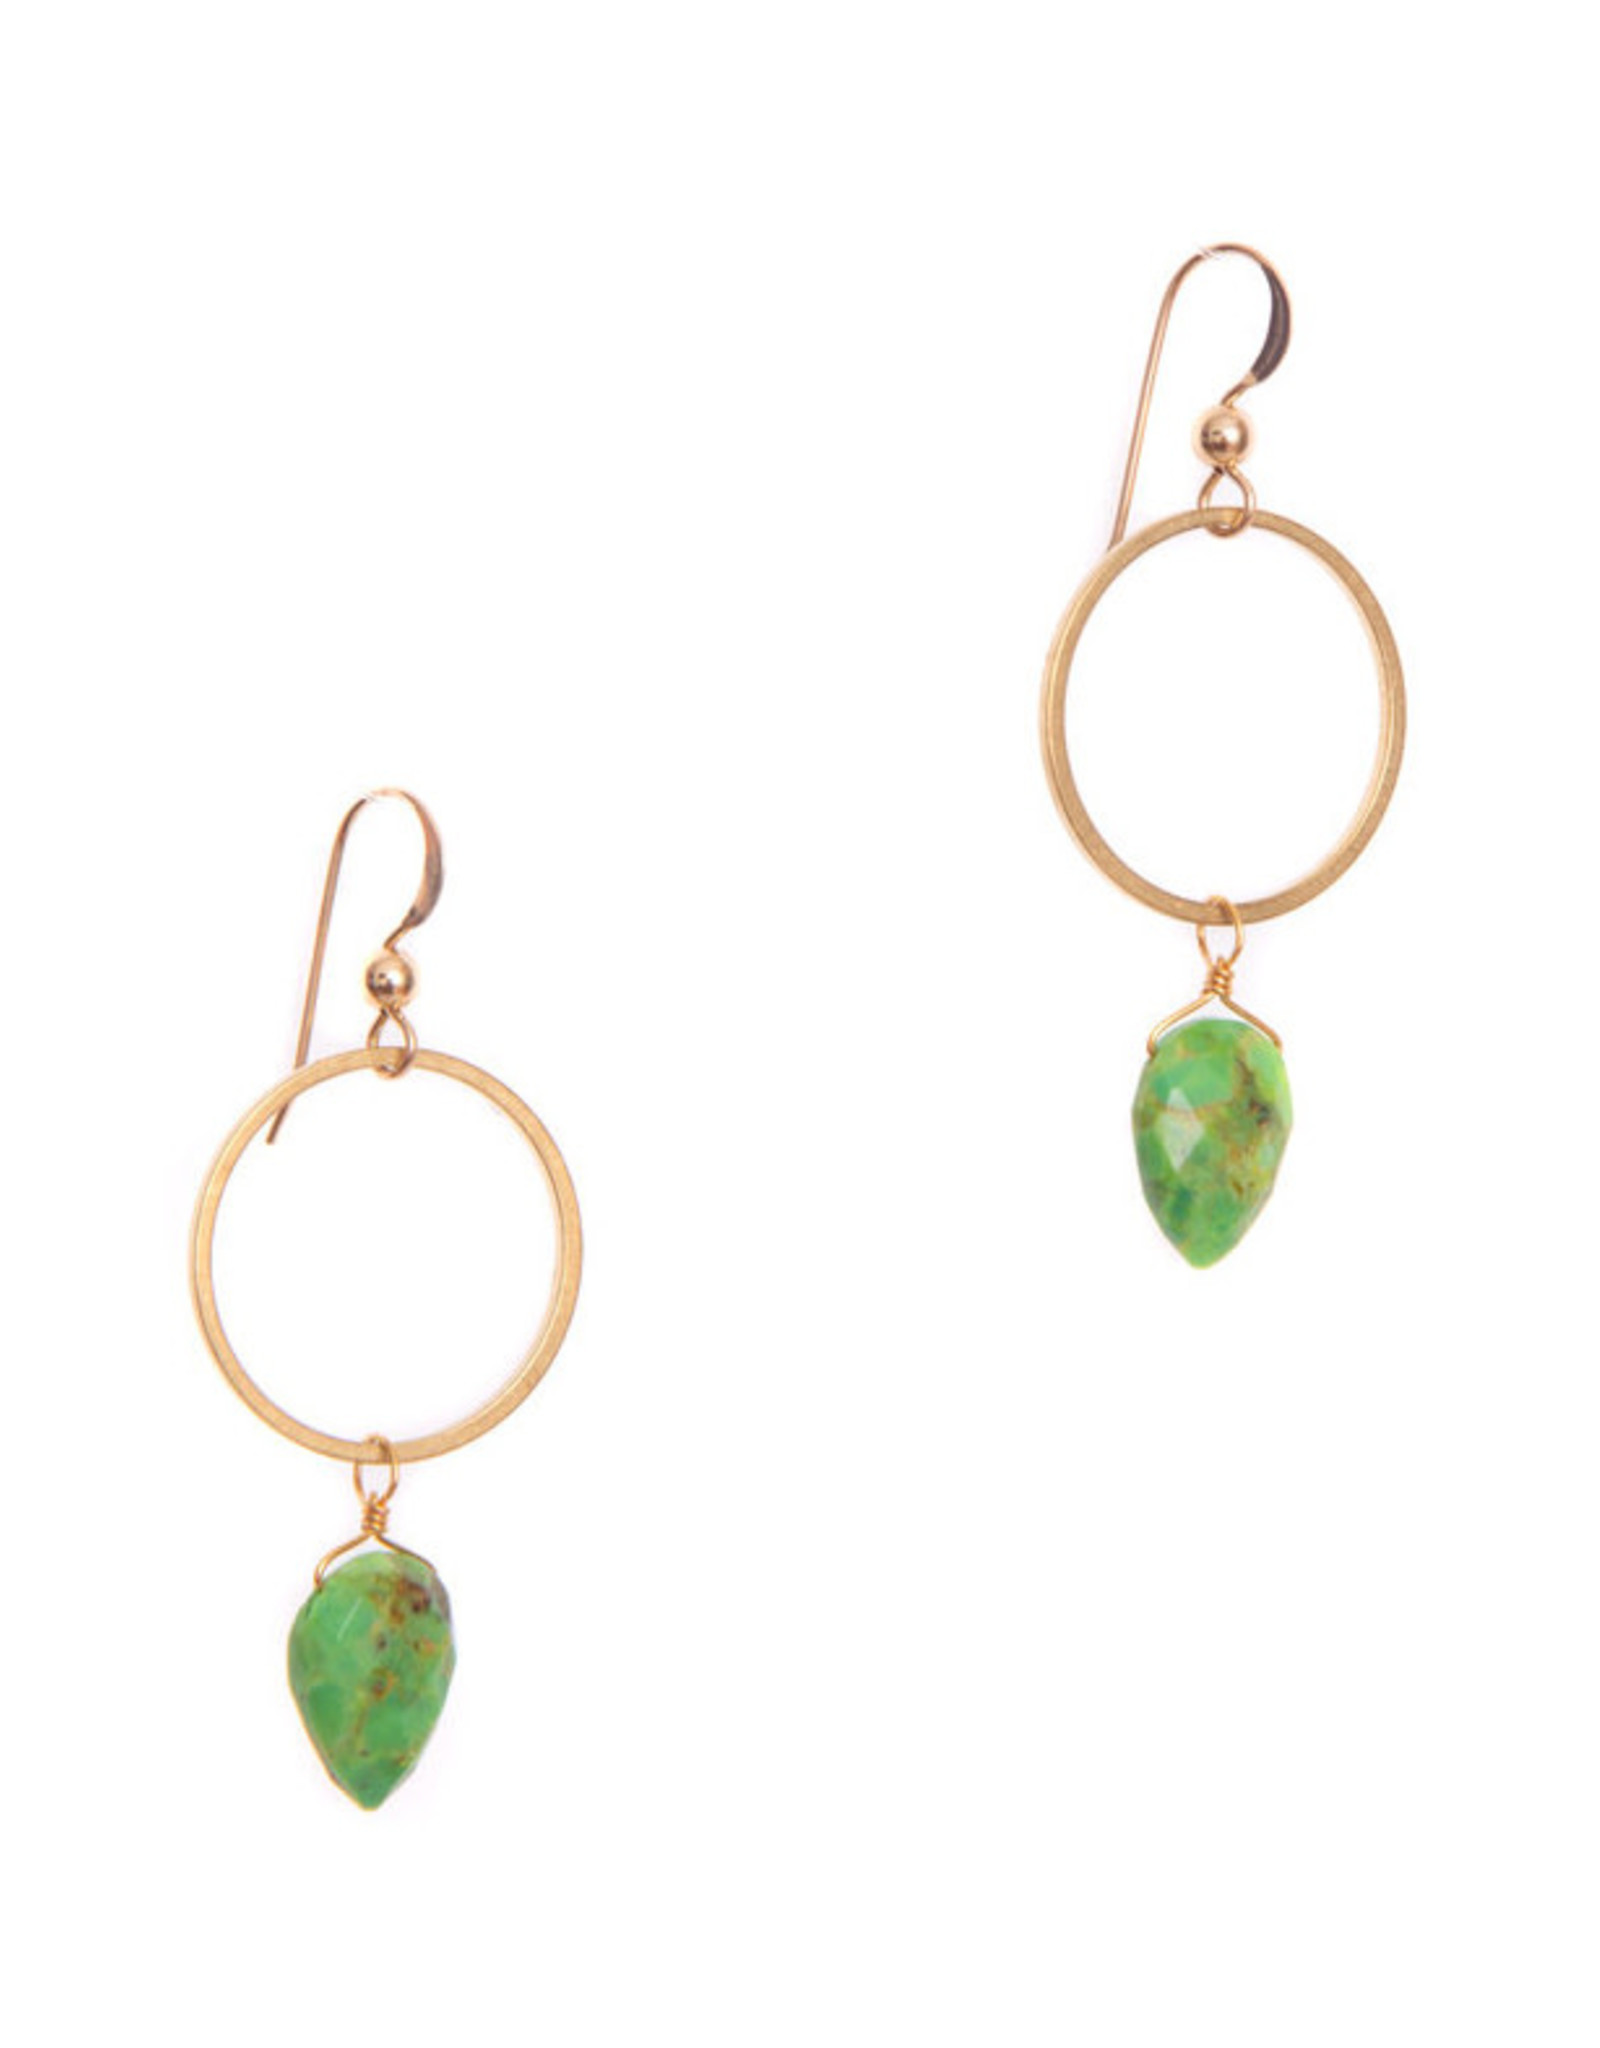 Hailey Gerrits Designs Rhea Earrings - Green Turquoise